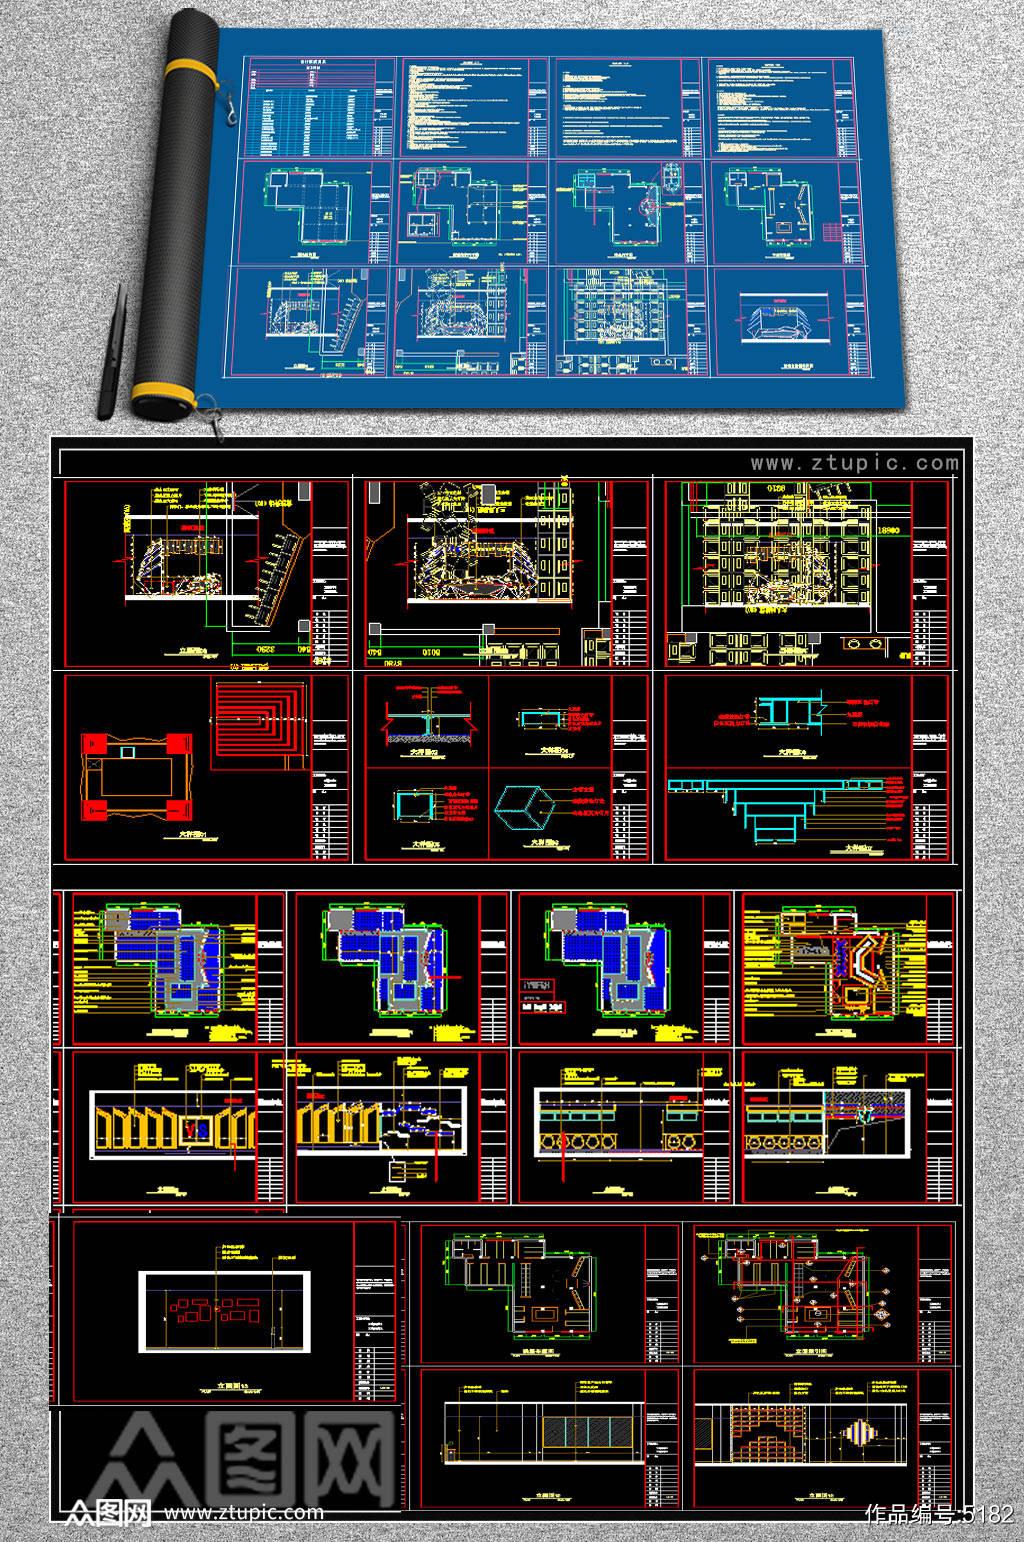 原创全套网吧CAD施工图素材